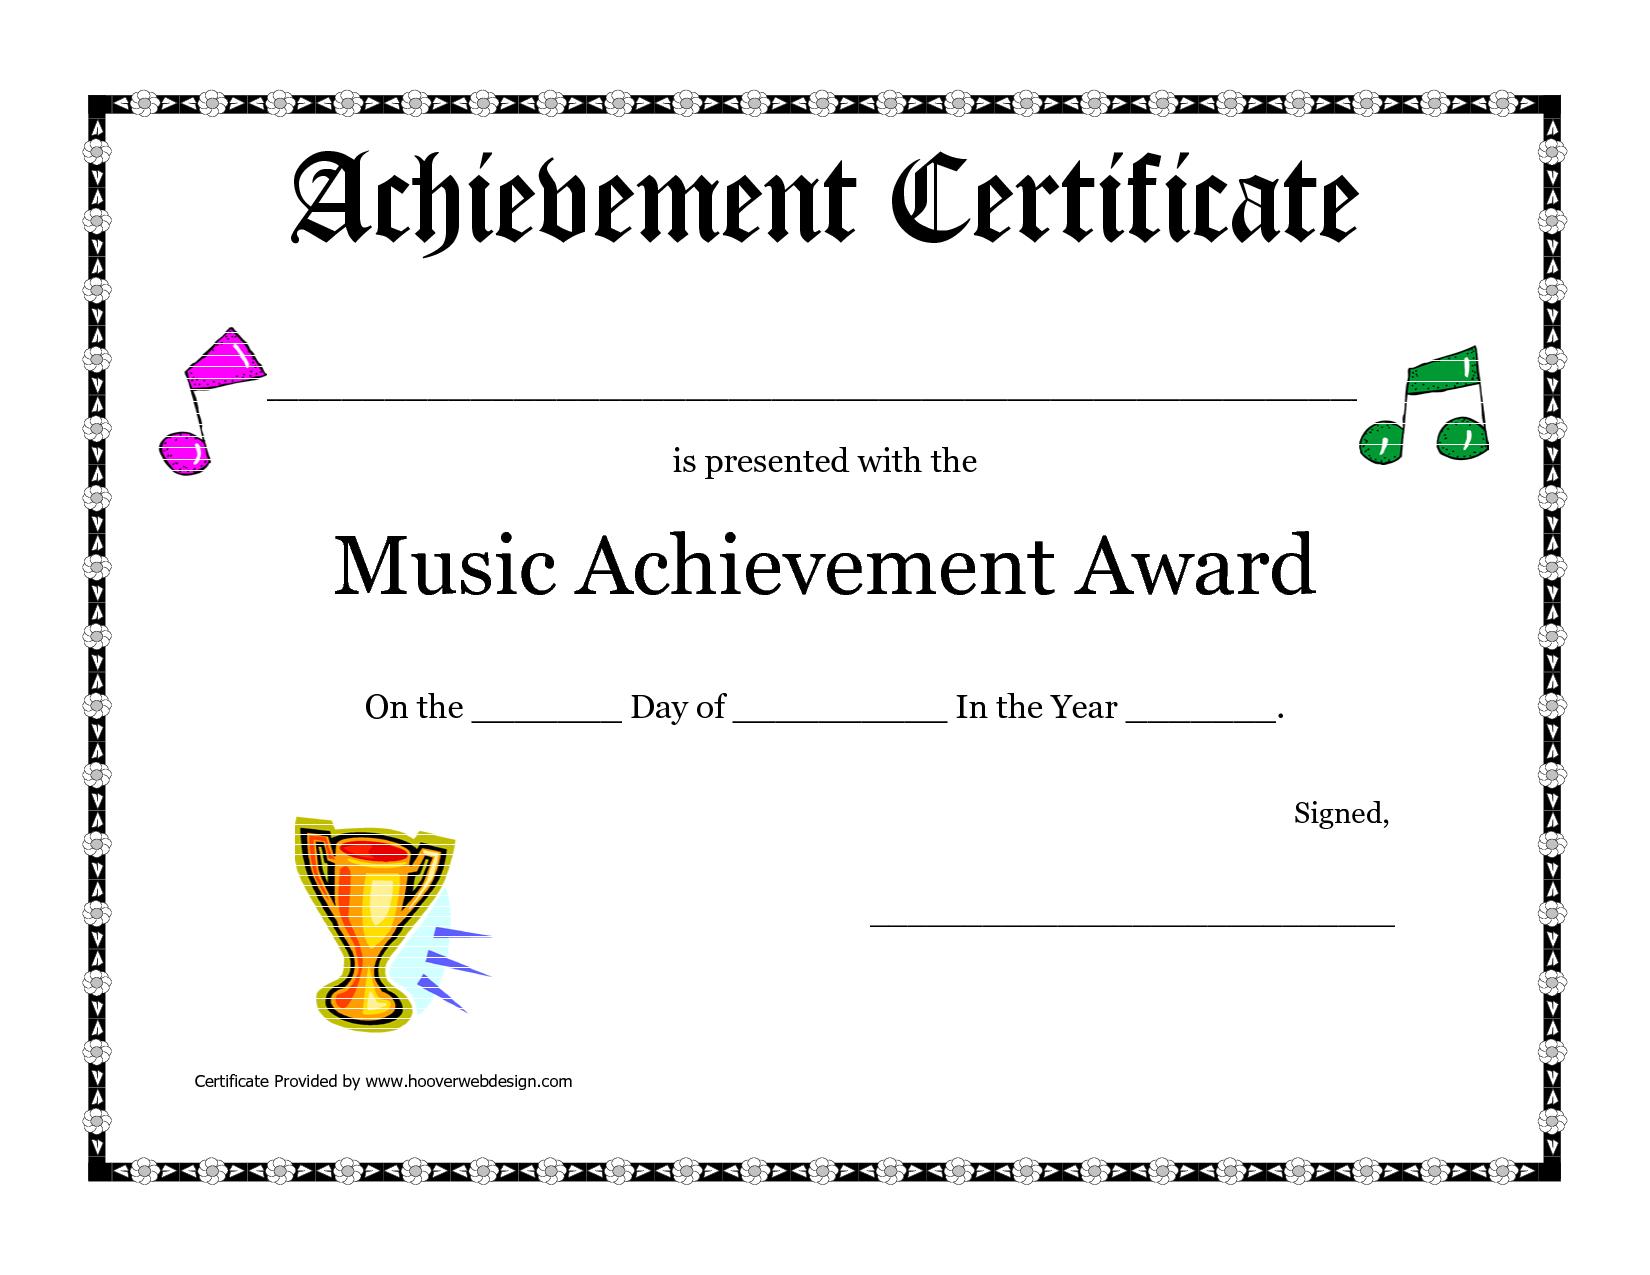 Free Printable Achievement Award Certificate Template | Recitals - Free Printable Piano Recital Certificates